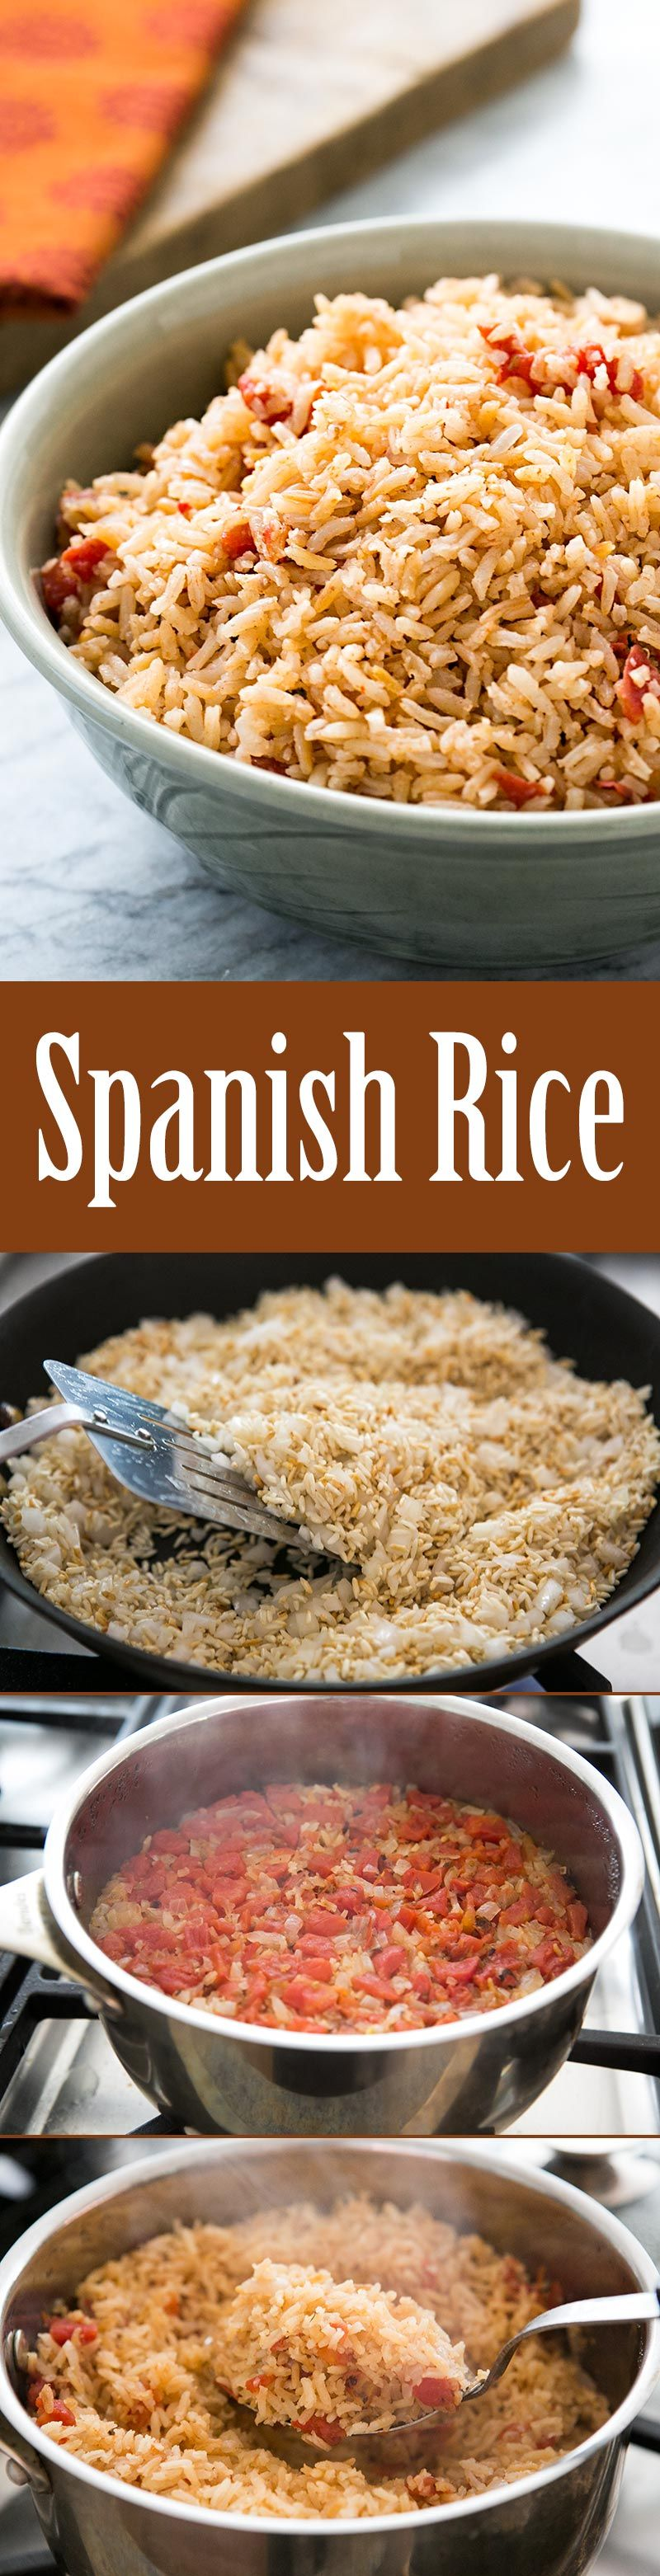 Spanish Rice Recipe Mexican food recipes, Spanish rice